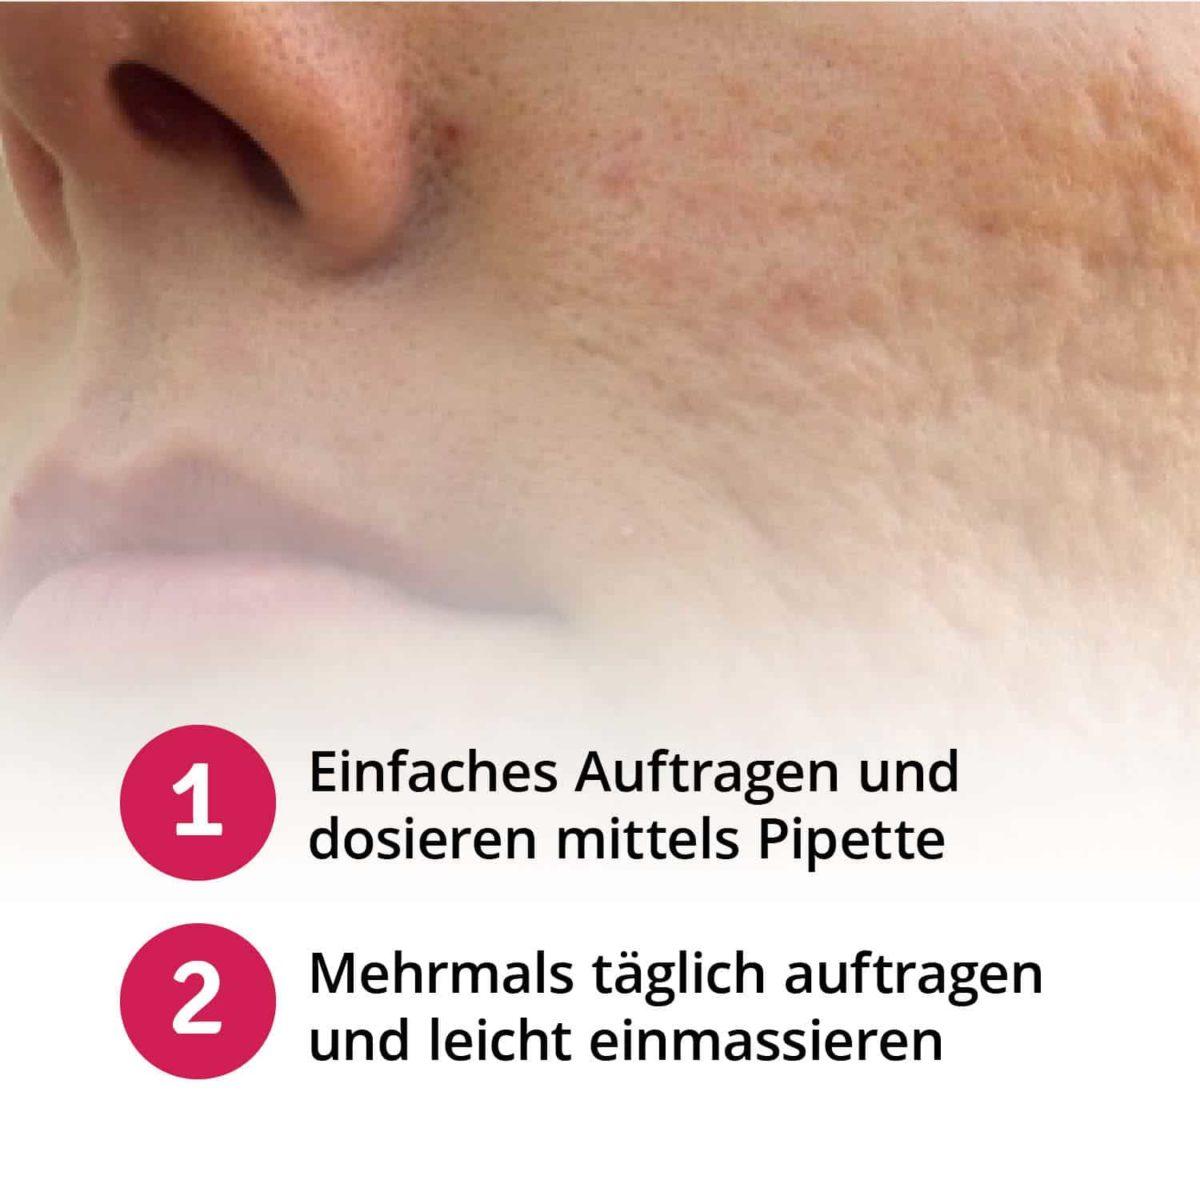 Casida Narbenpflegeöl Repair & Protect – 20 ml 10086758 PZN Apotheke Akne alte Aknenarben behandeln Gesicht Körper pflanzlich (1)6